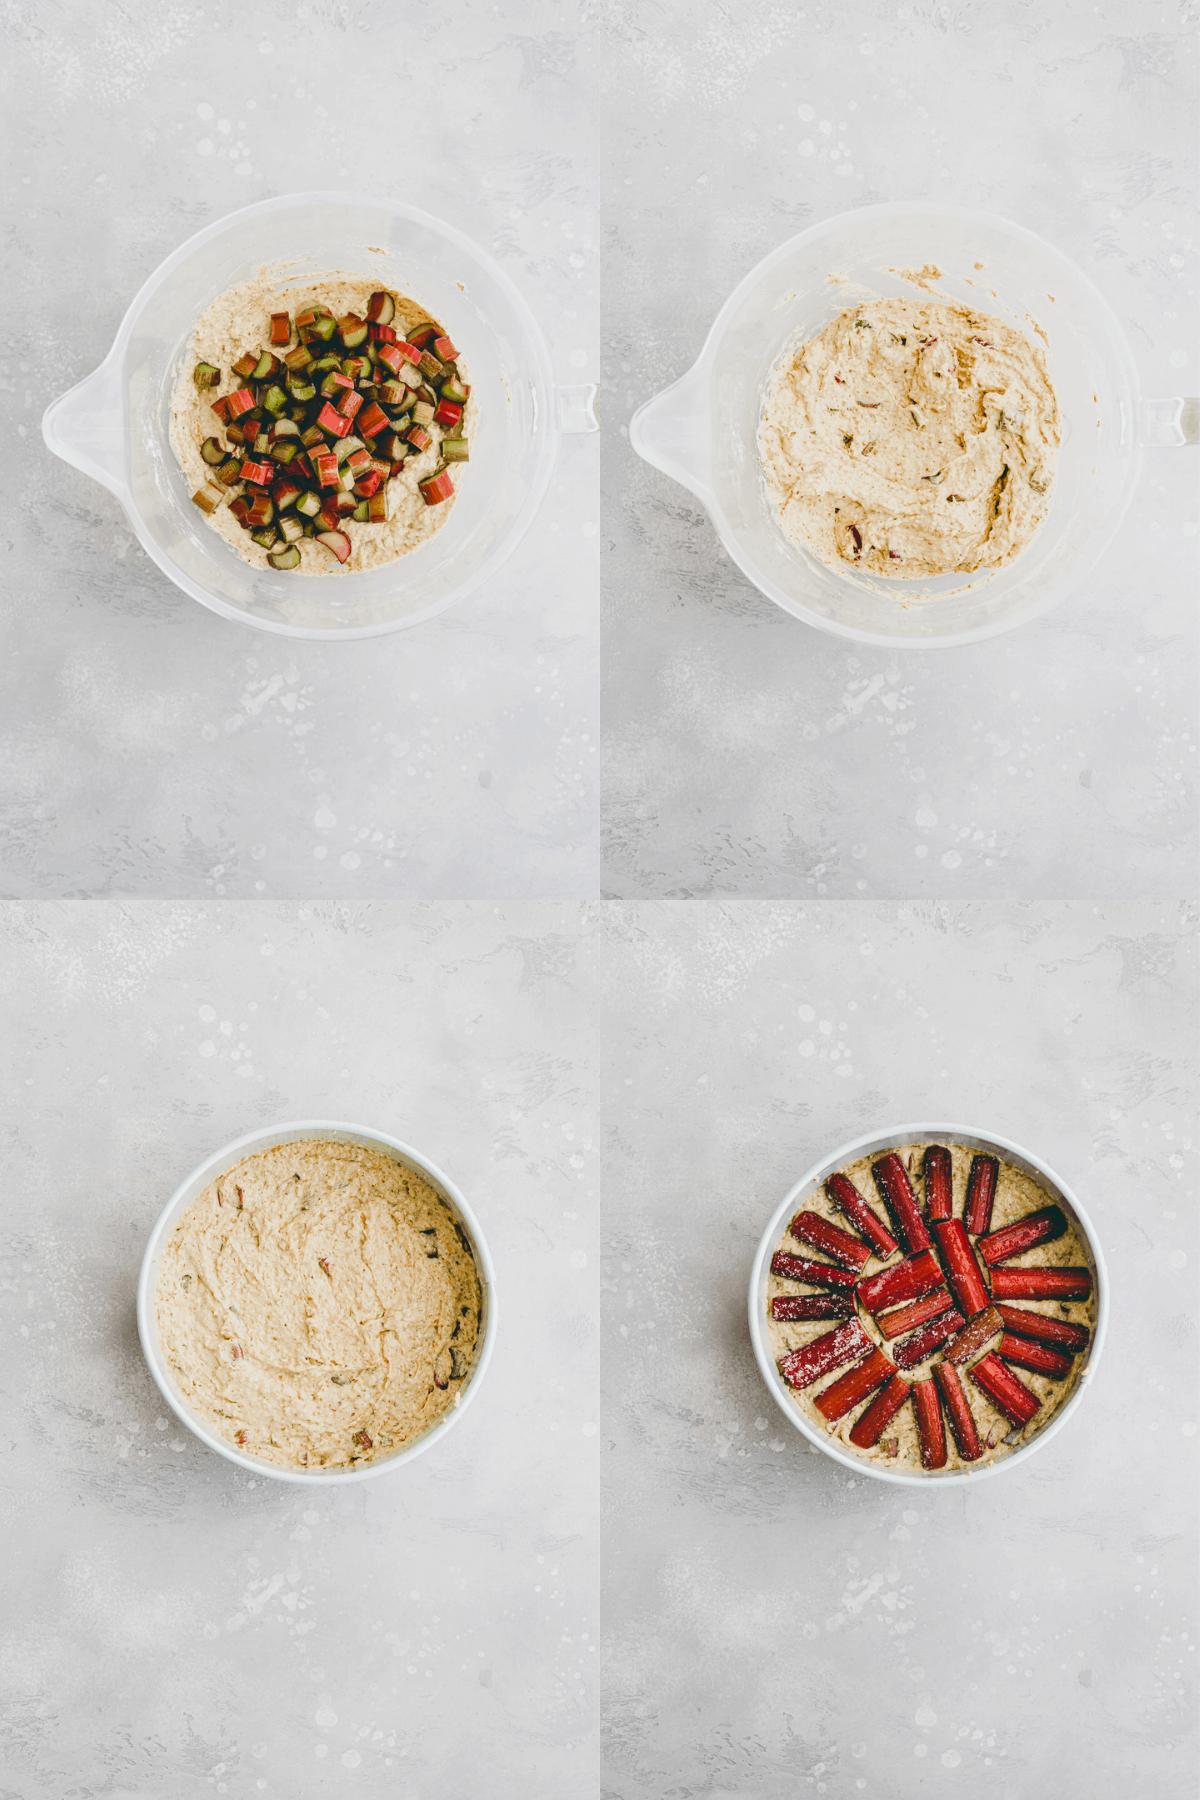 Rhubarb Almond Cake Recipe Step-6-9